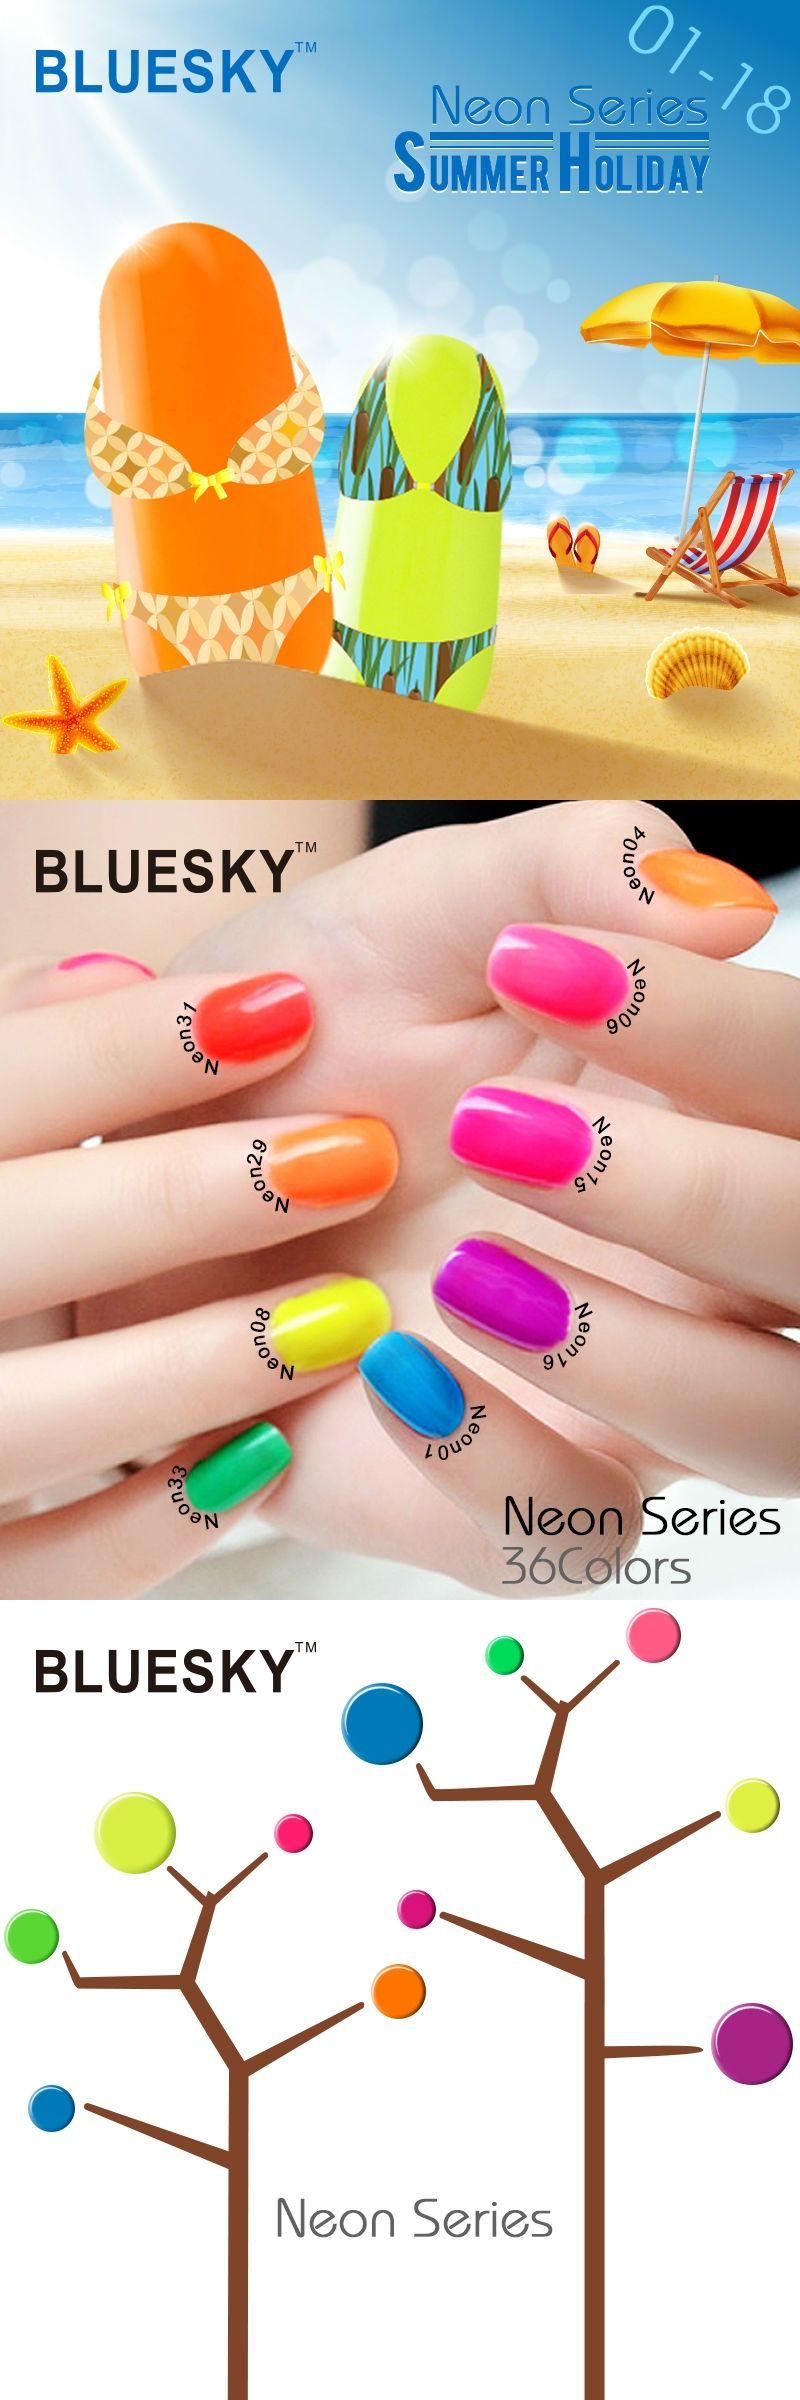 Neon Series 01-18 Summer Hot Sale Color Bluesky Beauty Supplies ...